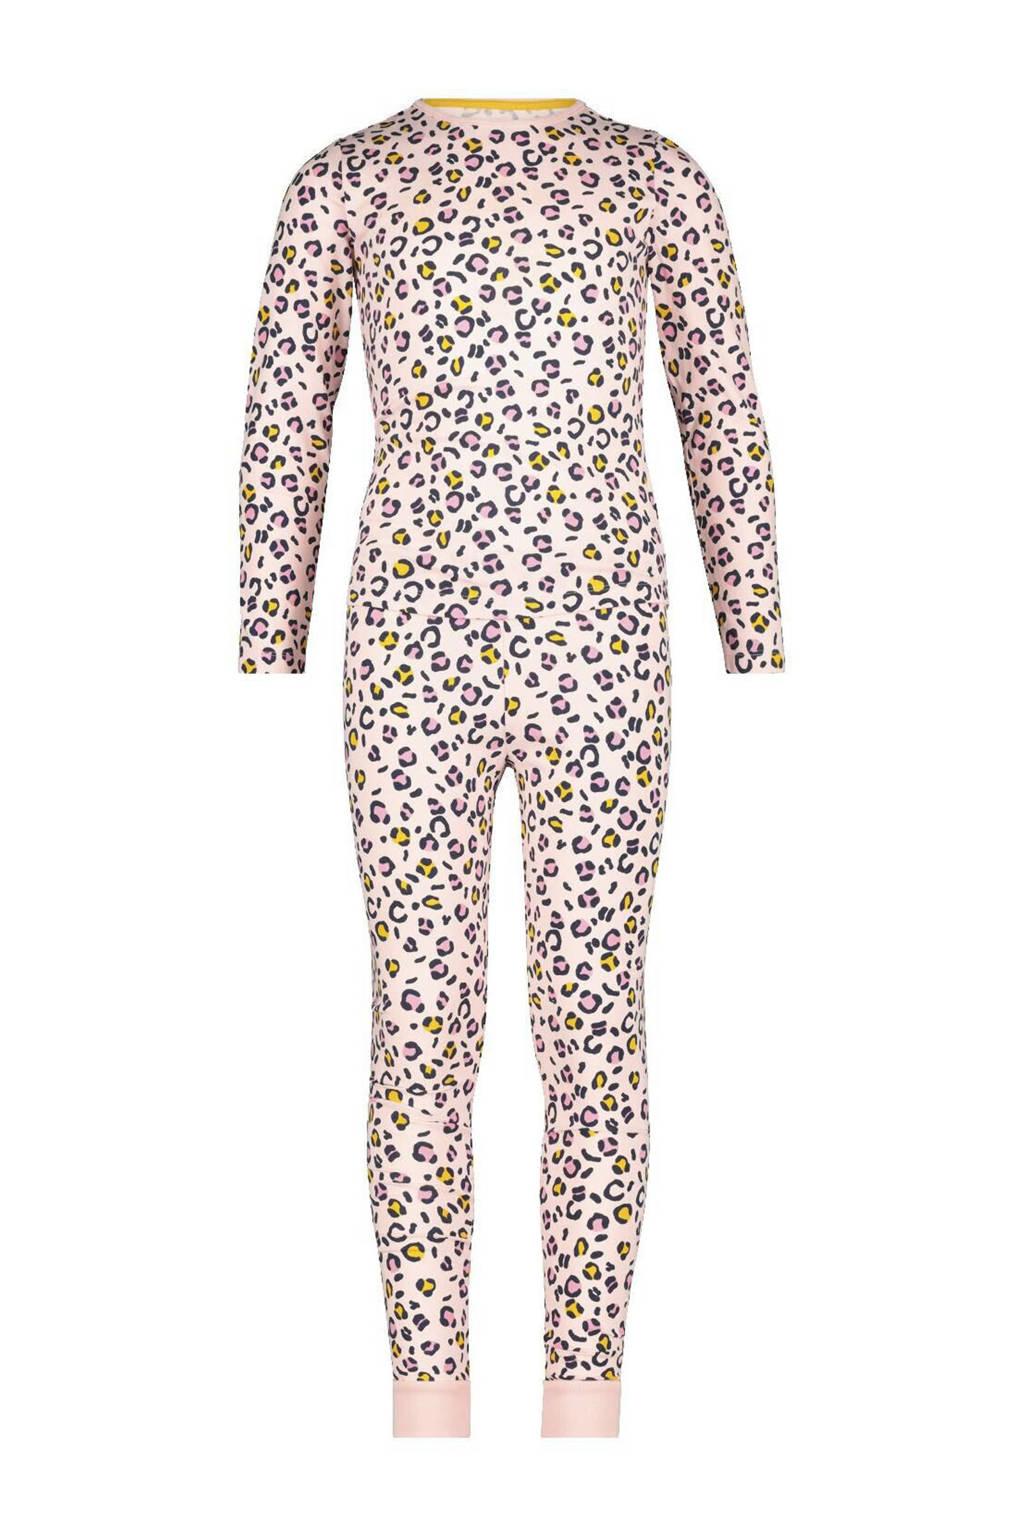 HEMA pyjama panterprint llichtroze, Roze